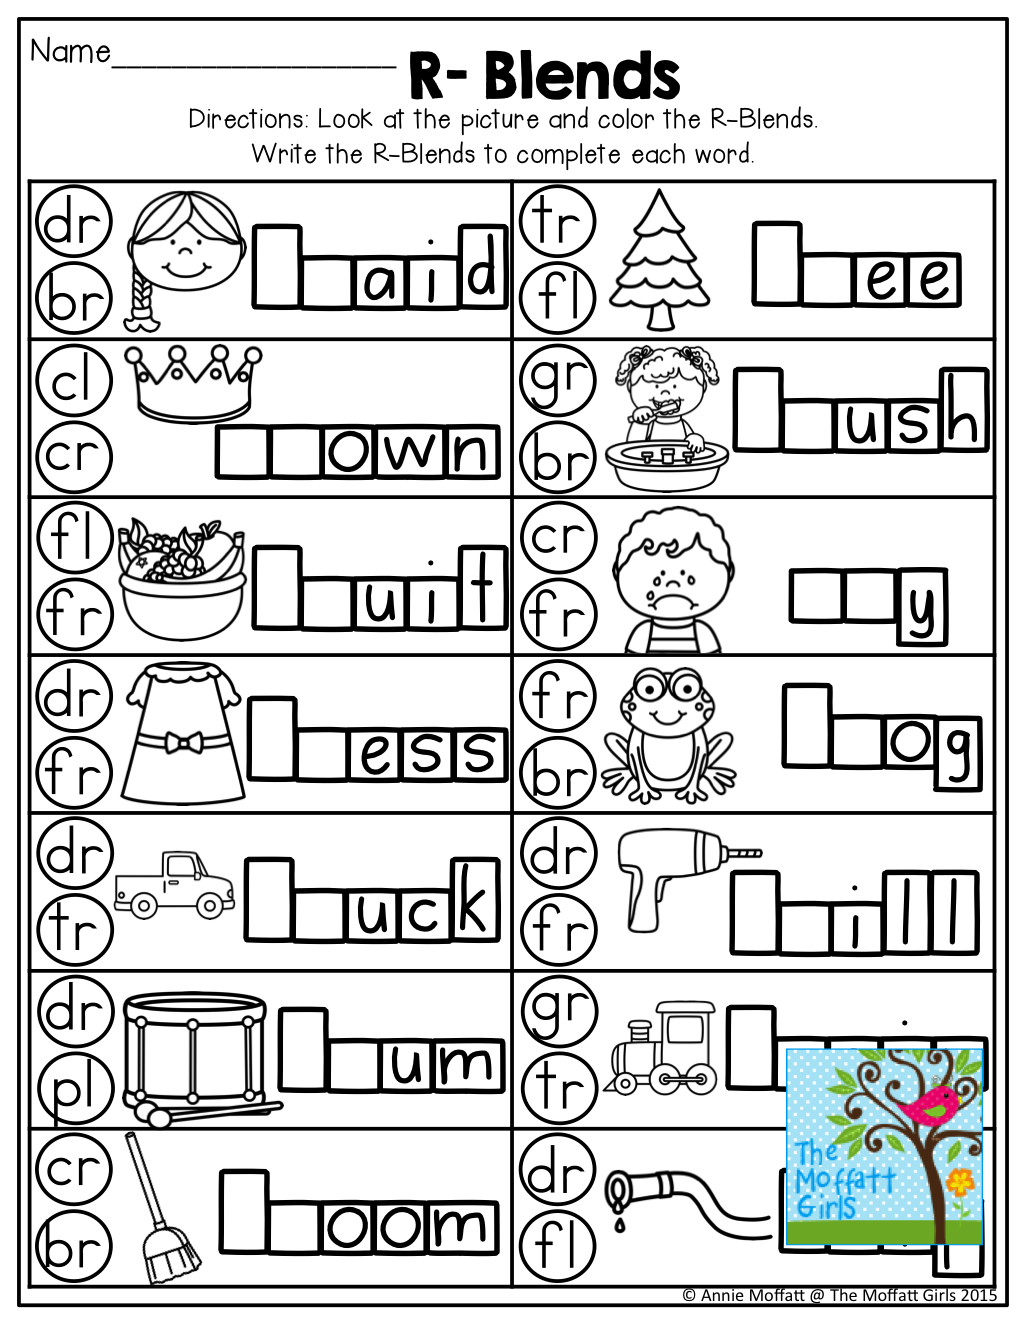 Free Printable R Blends Worksheets